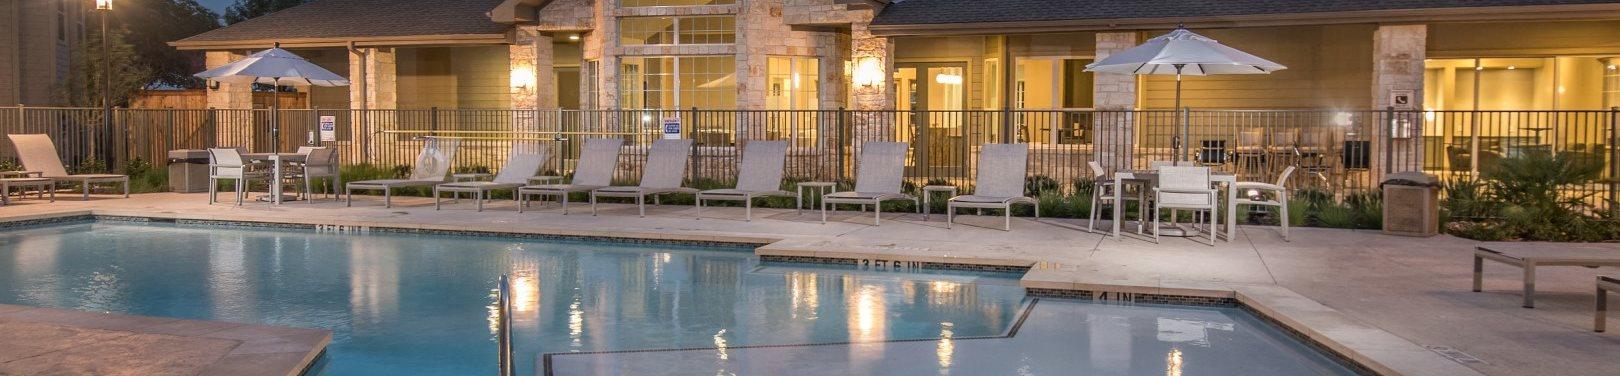 san antonio apartments with pool